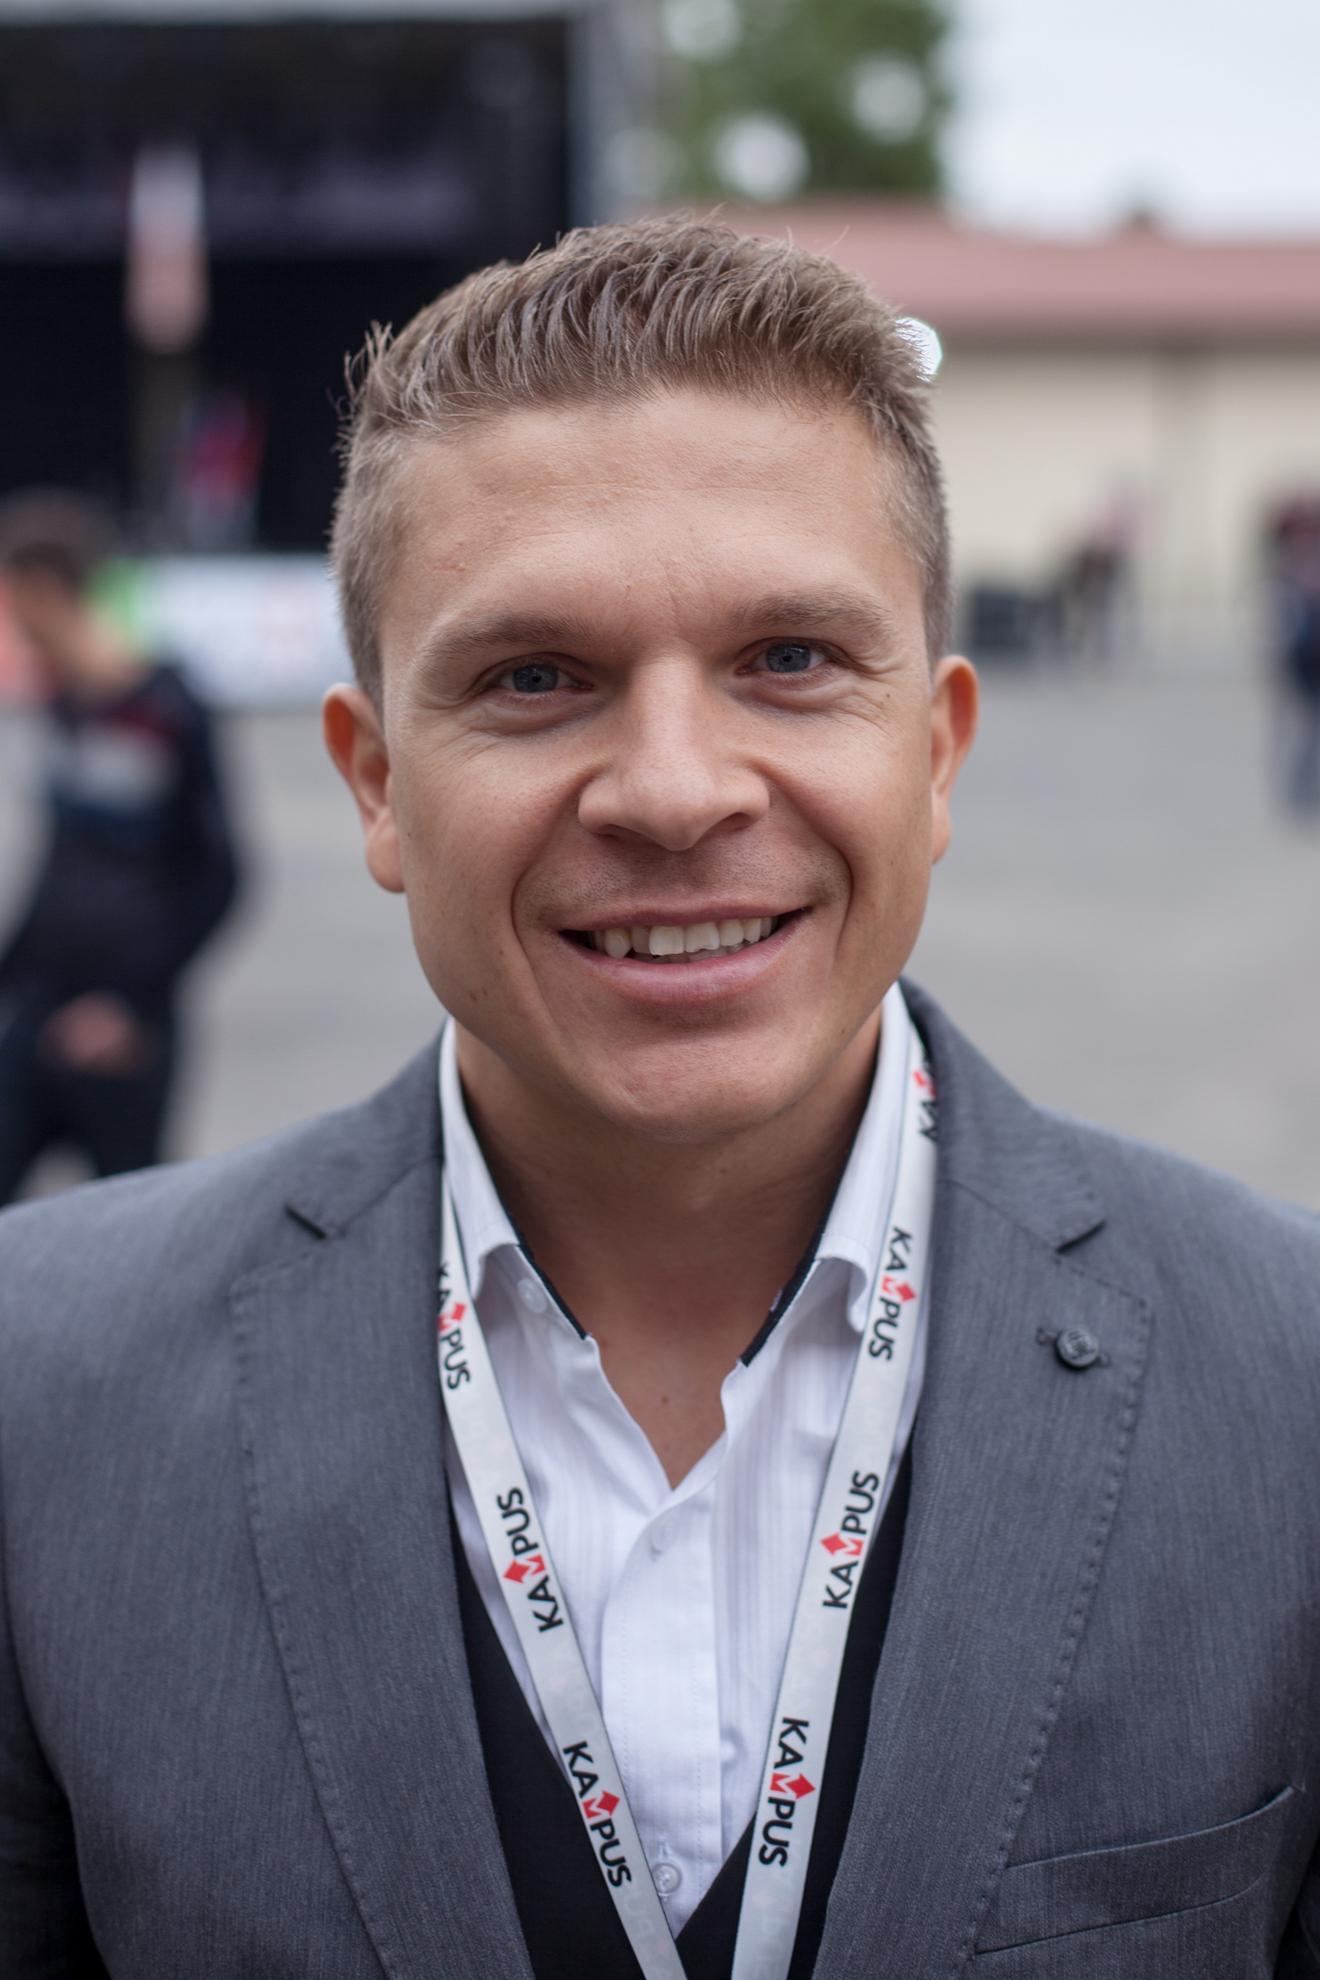 Bojan Kurež - Direktor študentskega kampusa